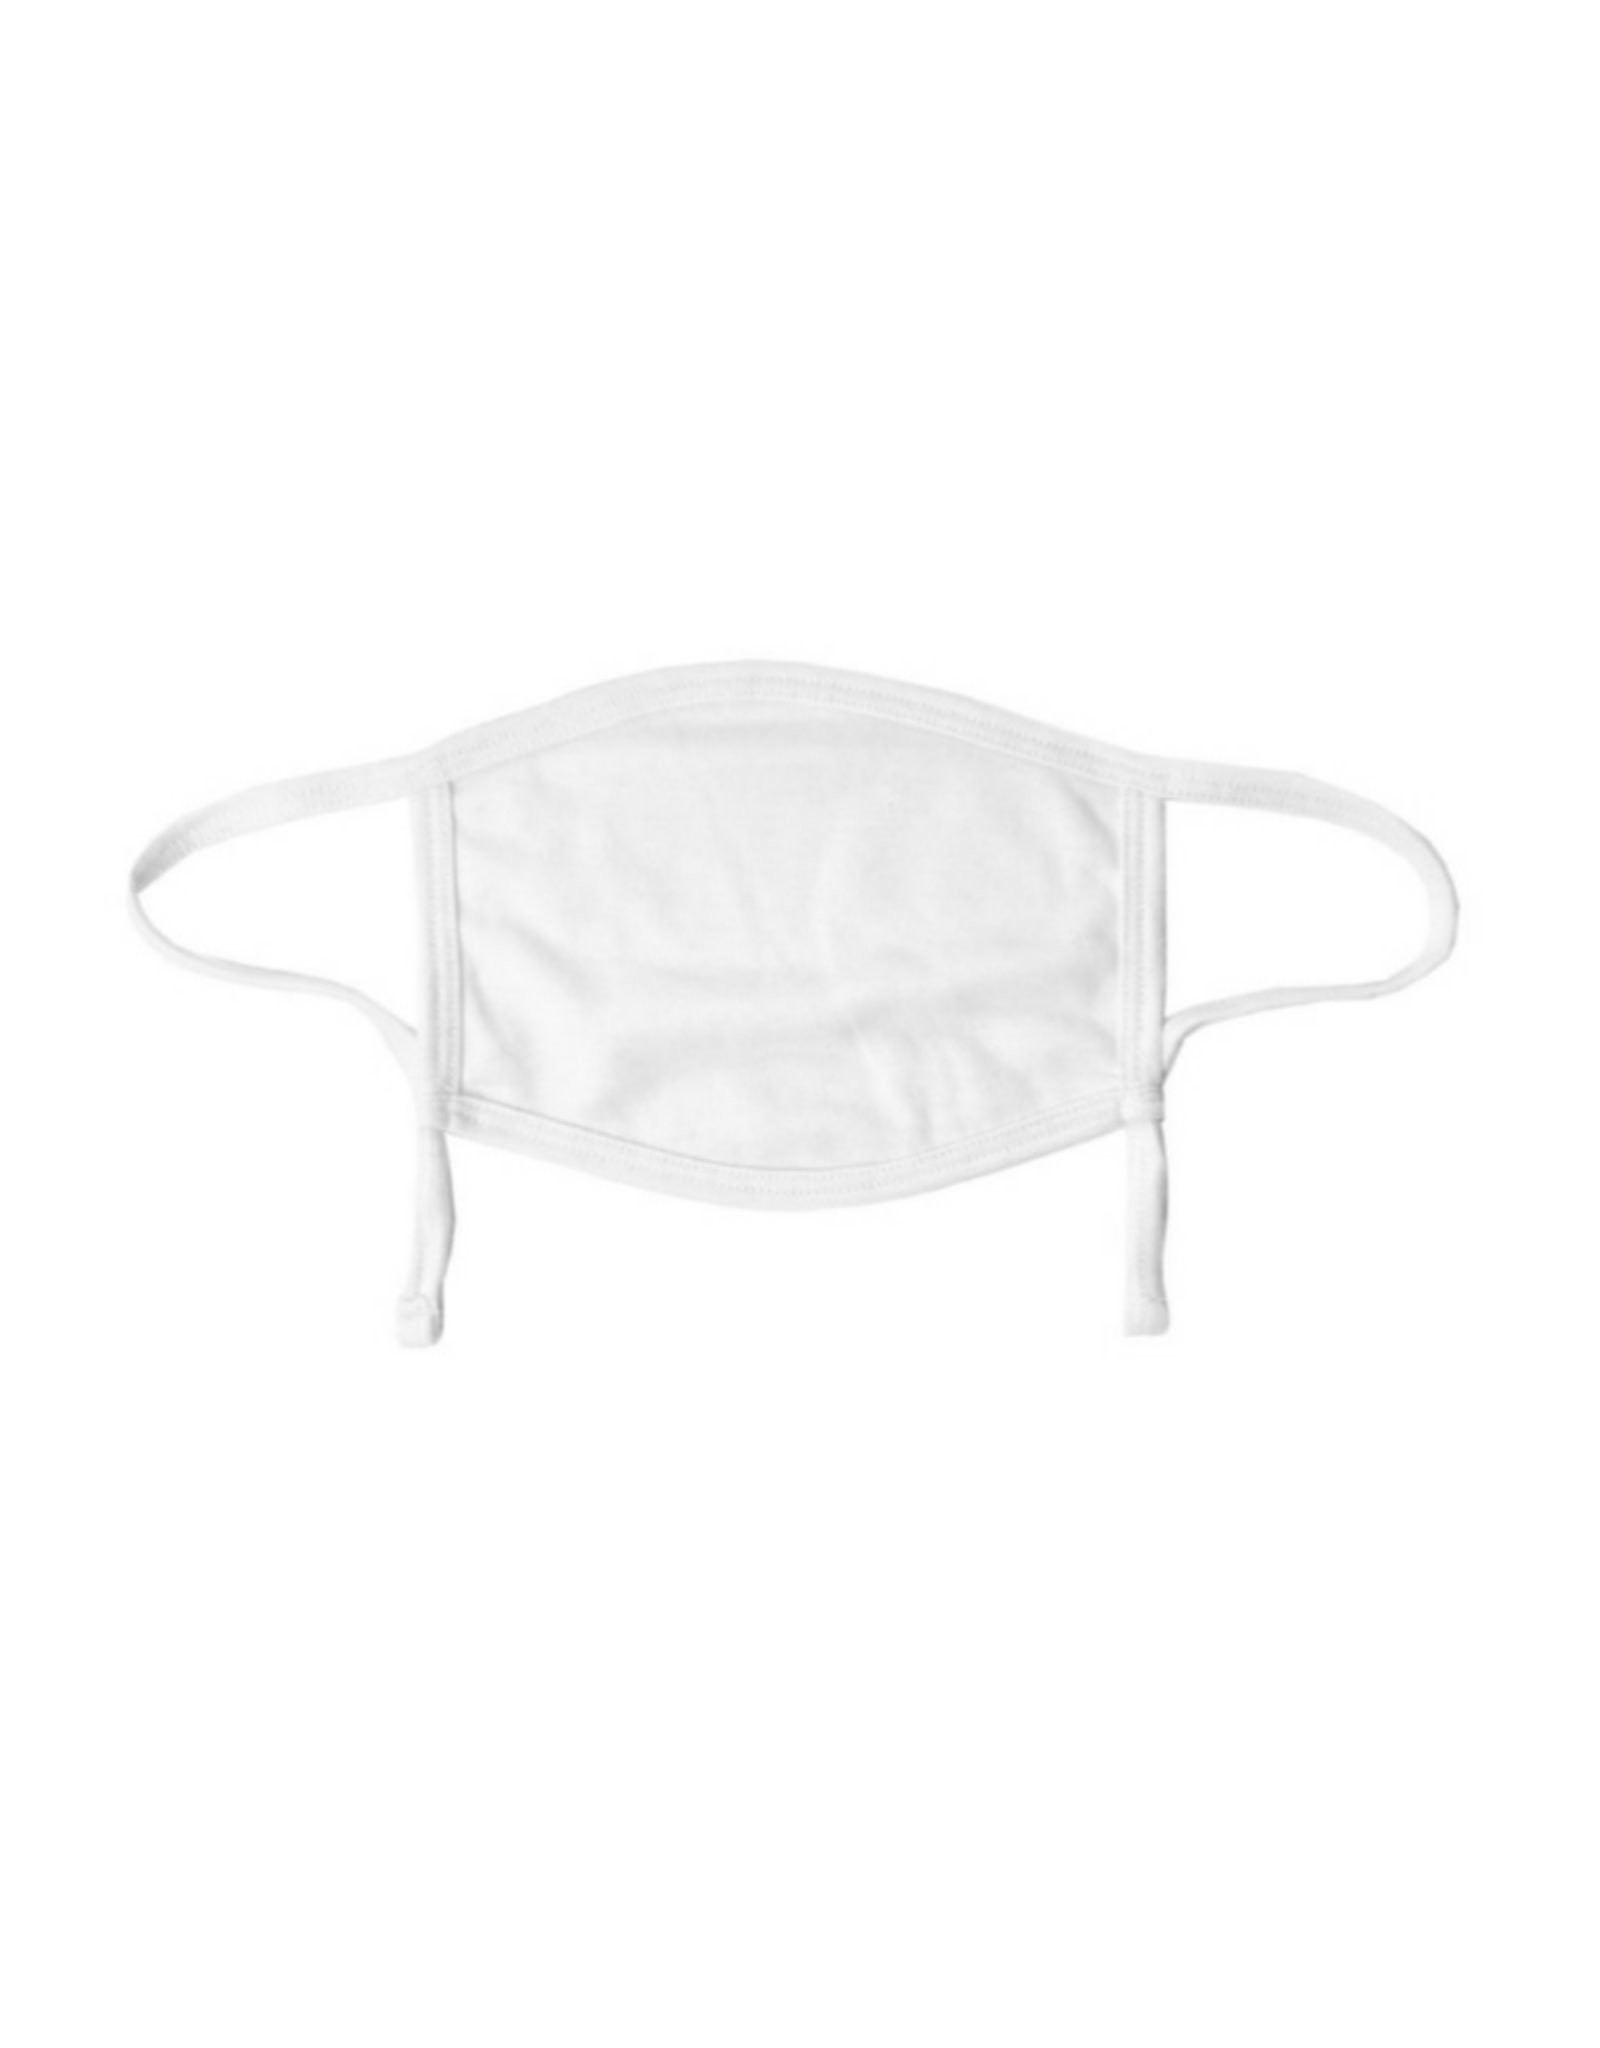 Adult White Adjustable Mask (Polyester)